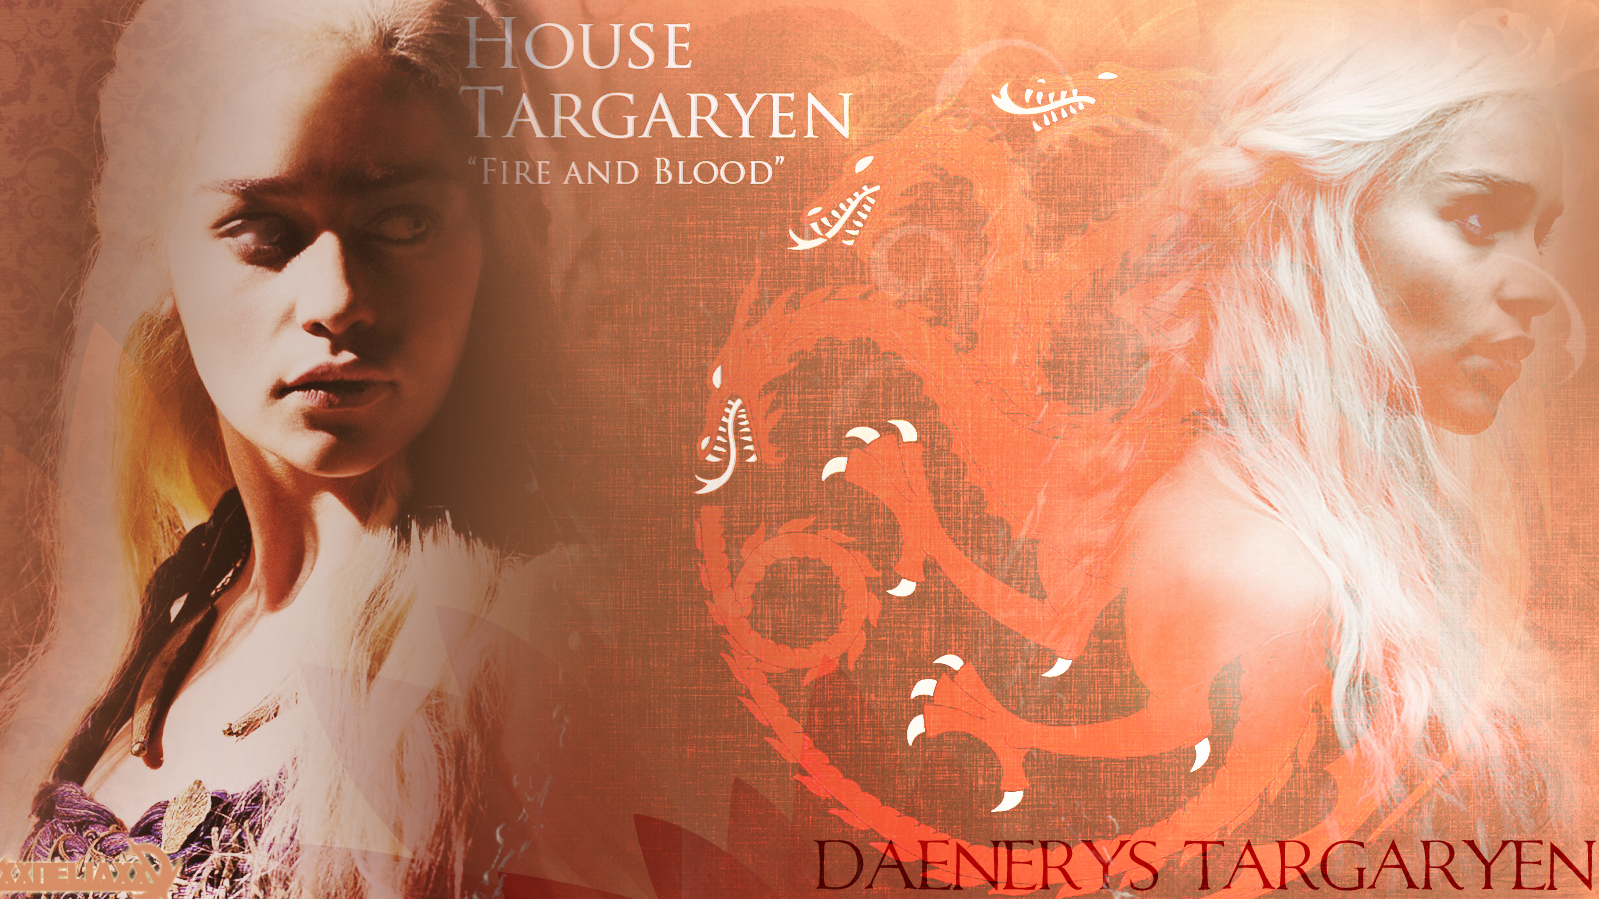 http://fc03.deviantart.net/fs71/f/2012/182/8/7/daenerys_targaryen_wallpaper_by_xxneliaxx-d55j8cy.jpg